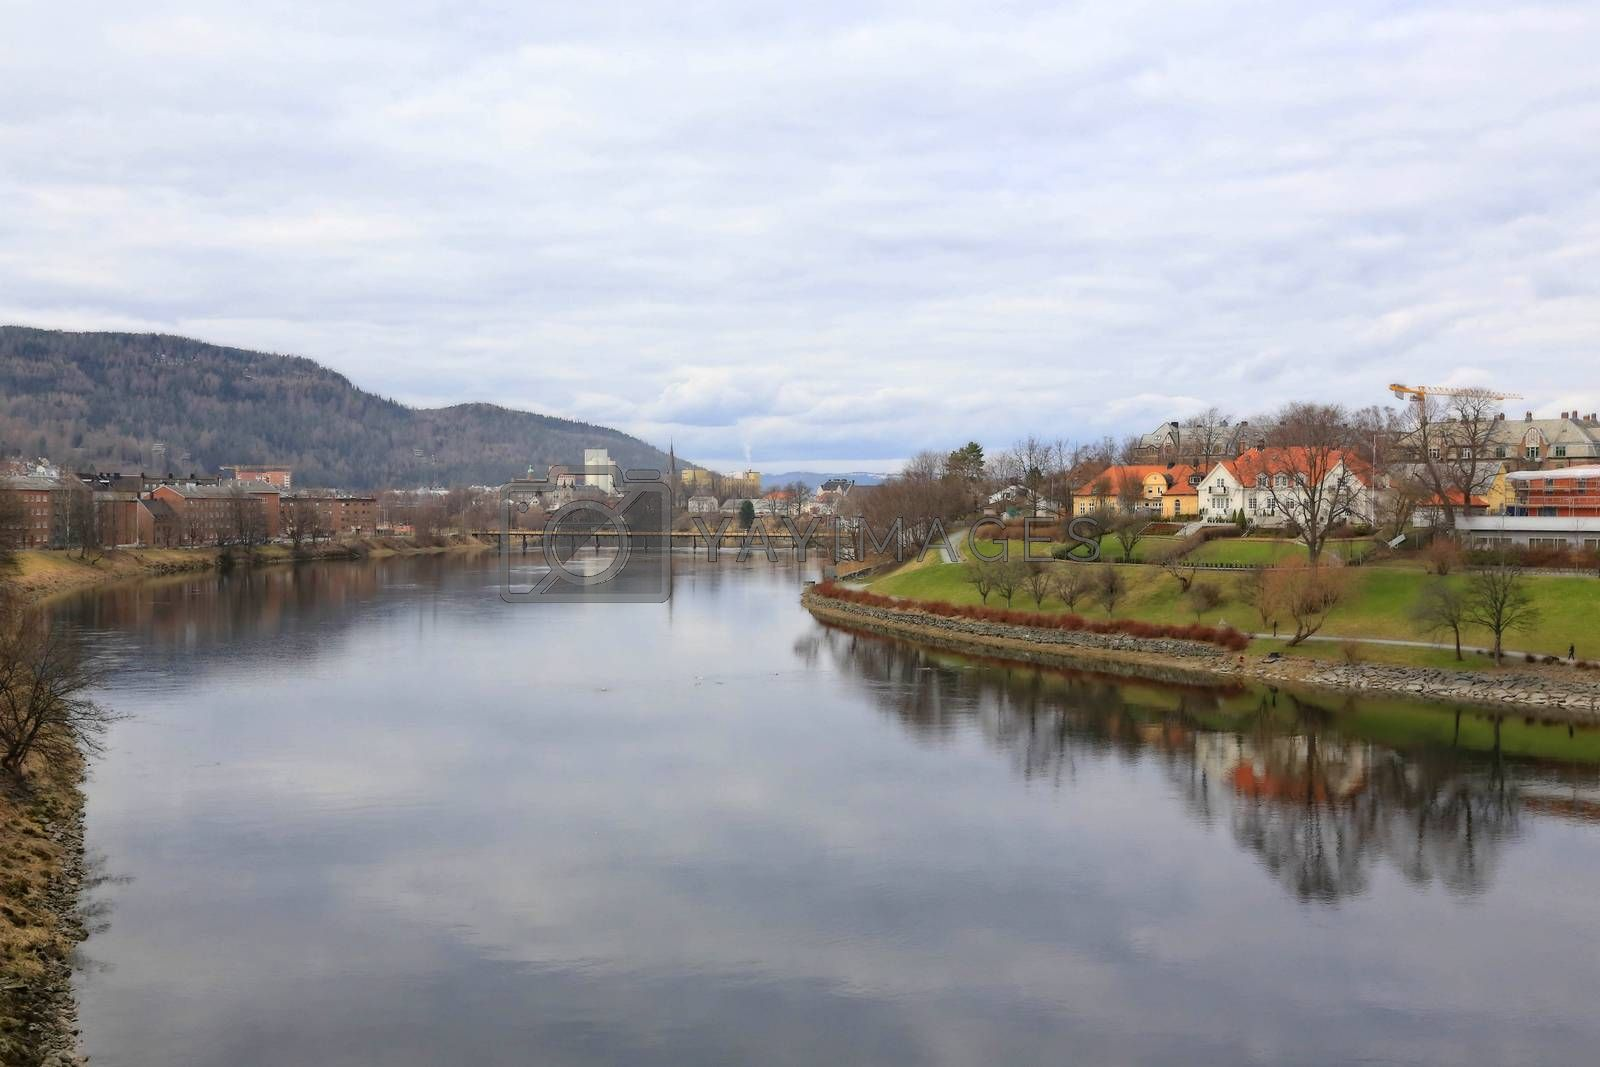 Rundtur i Trondheim en vårdag  - Nidelven